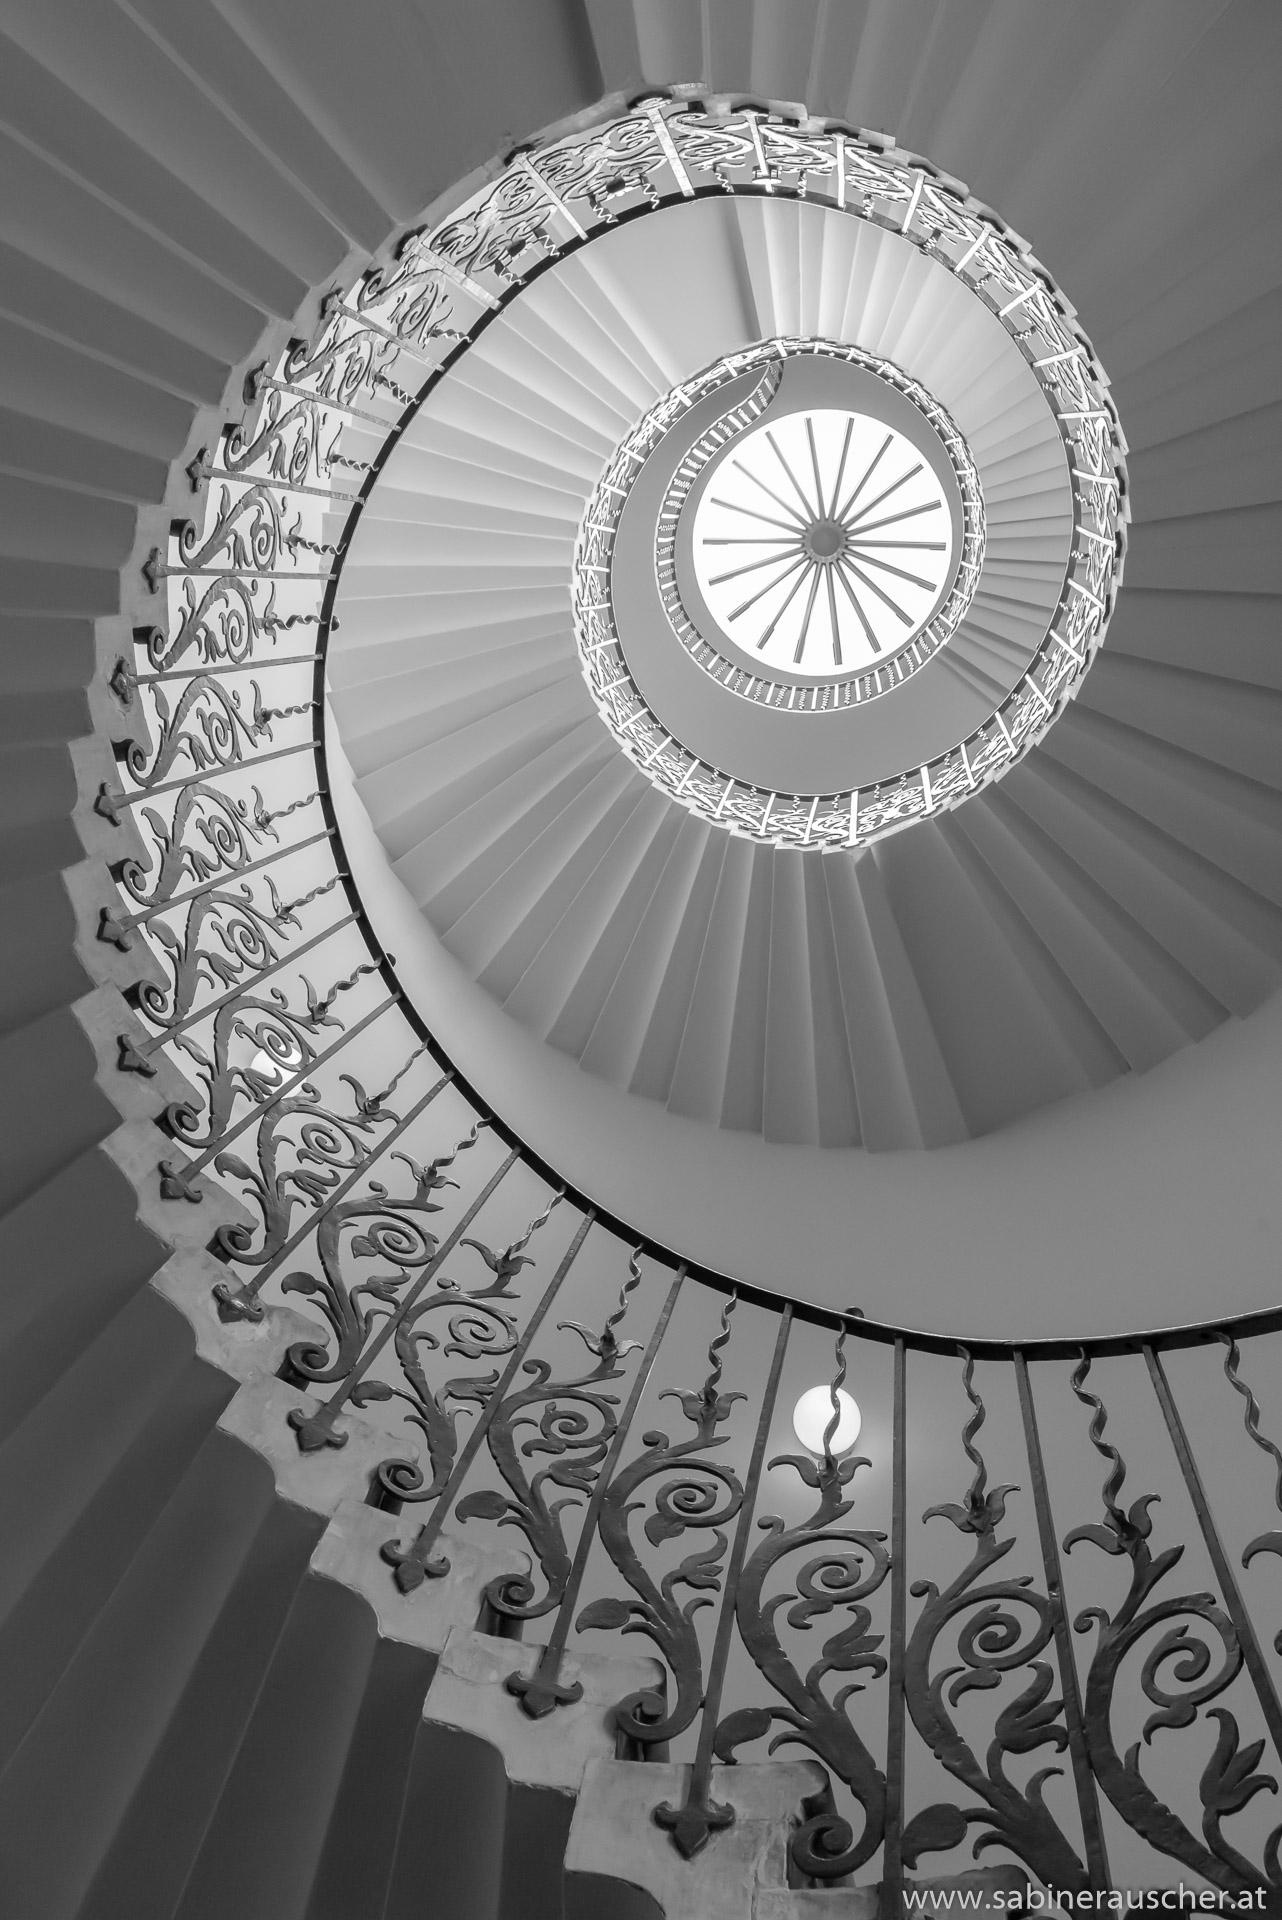 Spiral Staircase in the Queen´s House in London | spiralförmiges Stiegenhaus im Queen´s House in London